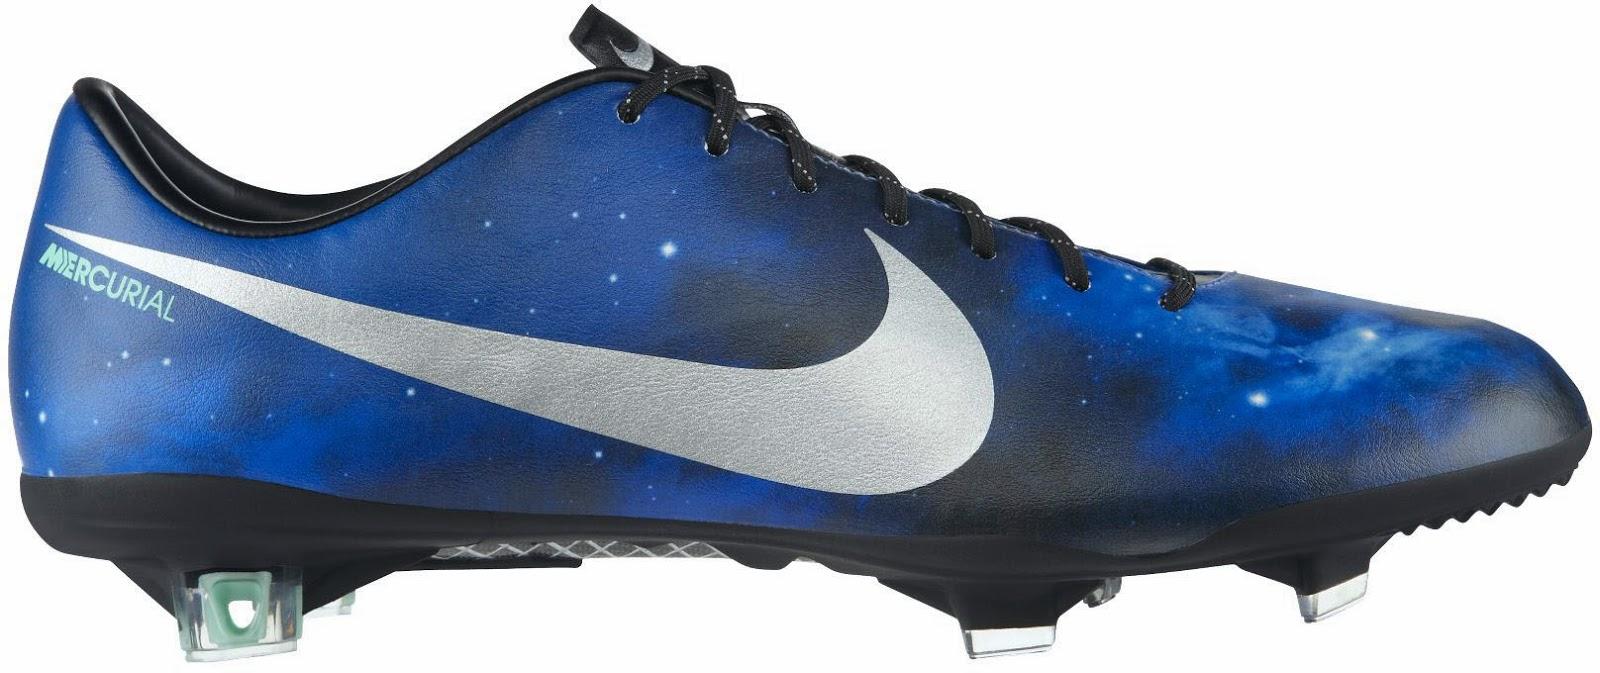 Nike CR7 Mercurial Vapor 9 Galaxy Ronaldo Edition